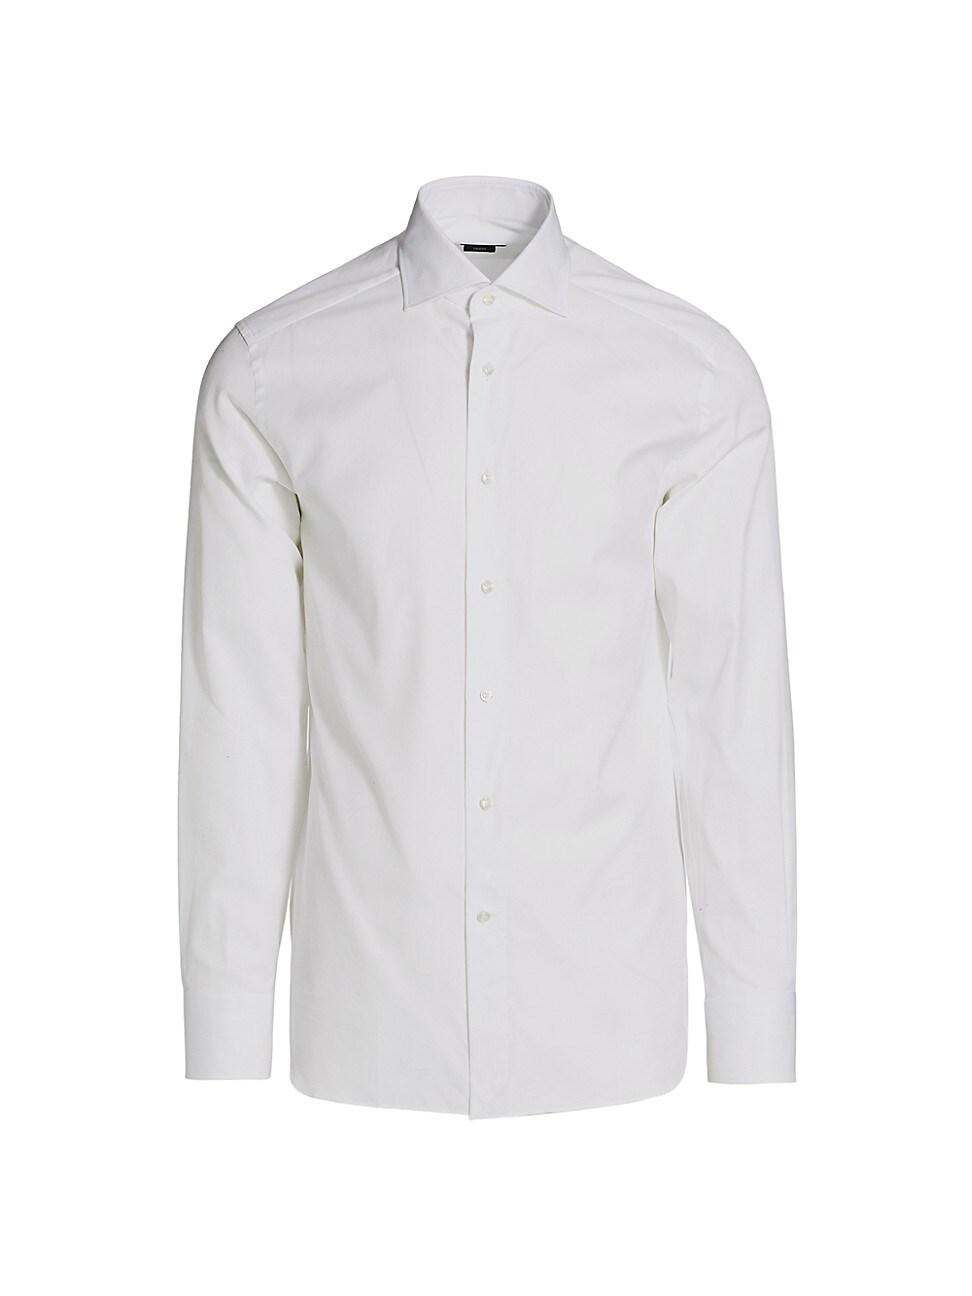 Ermenegildo Zegna Trofeo Textured Sport Shirt In White